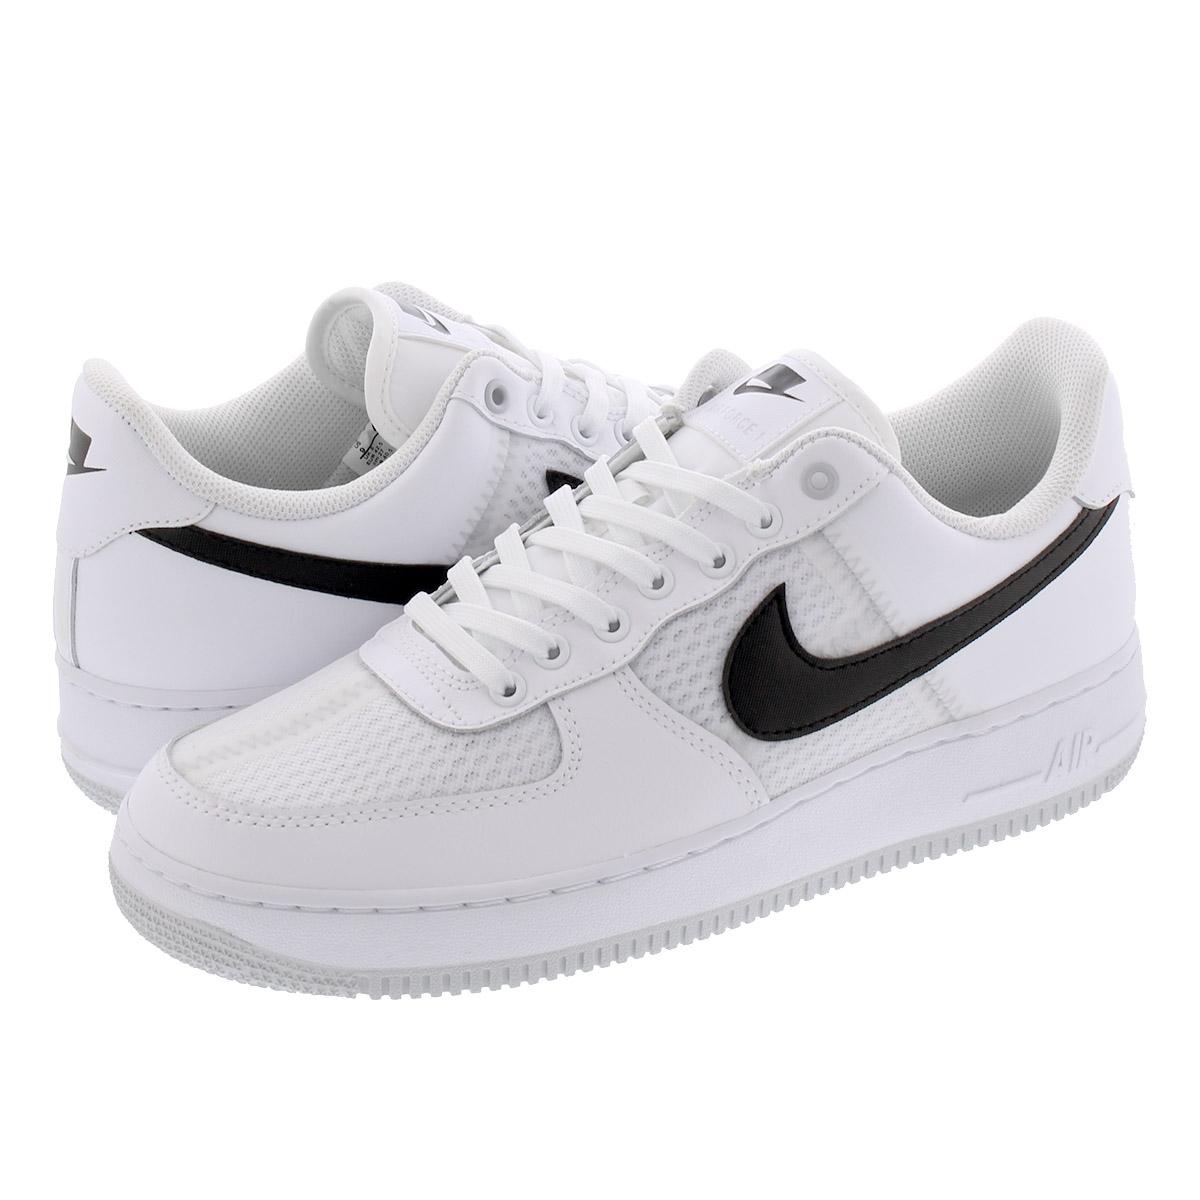 Nike Air Force 1 '07 LV8 1 WhiteBlack Pure Platinum | Online Shop